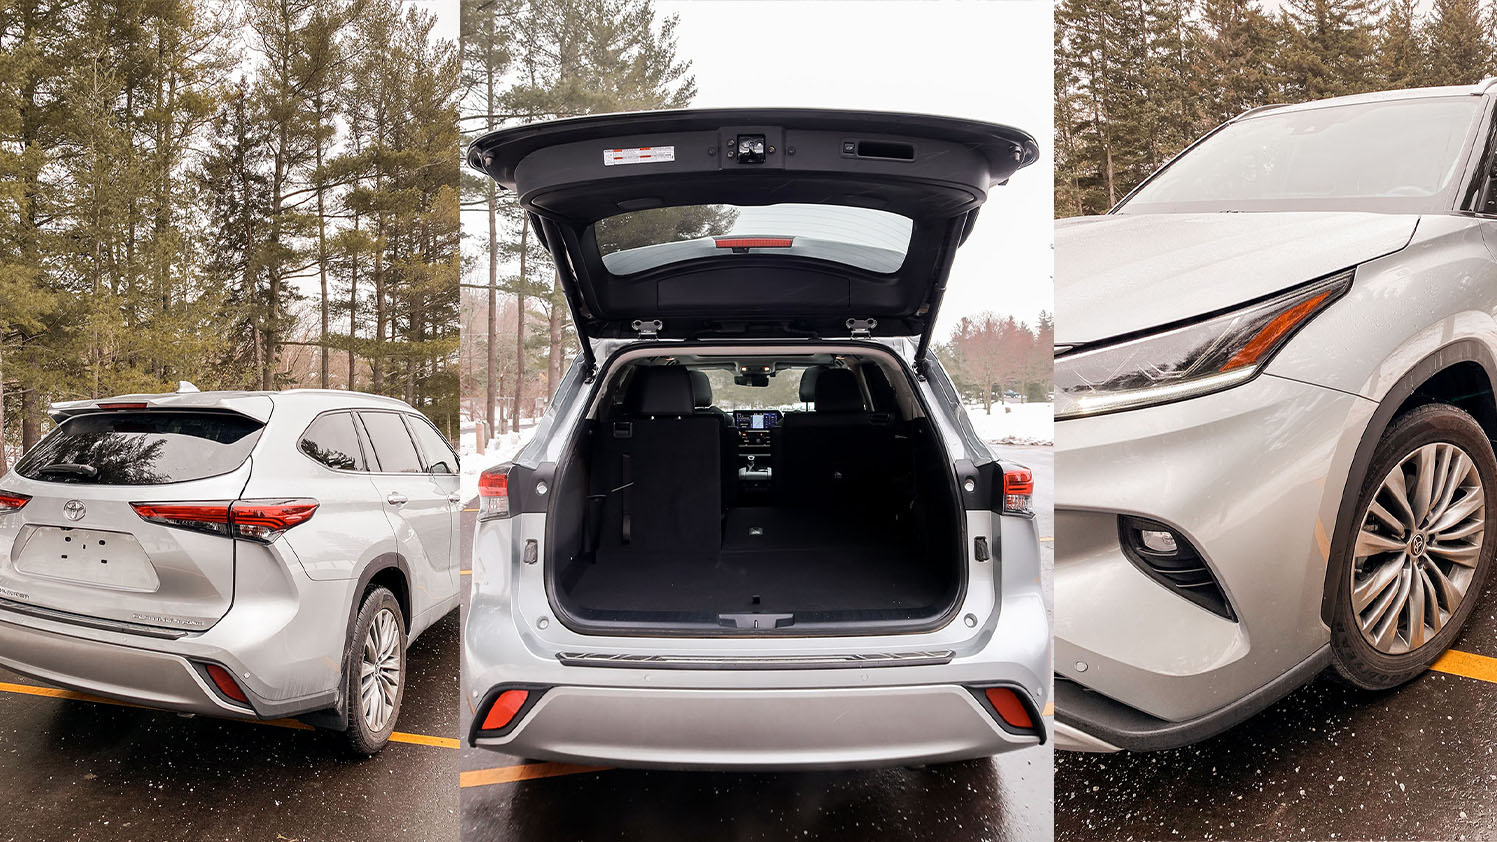 Toyota Highlander cargo space